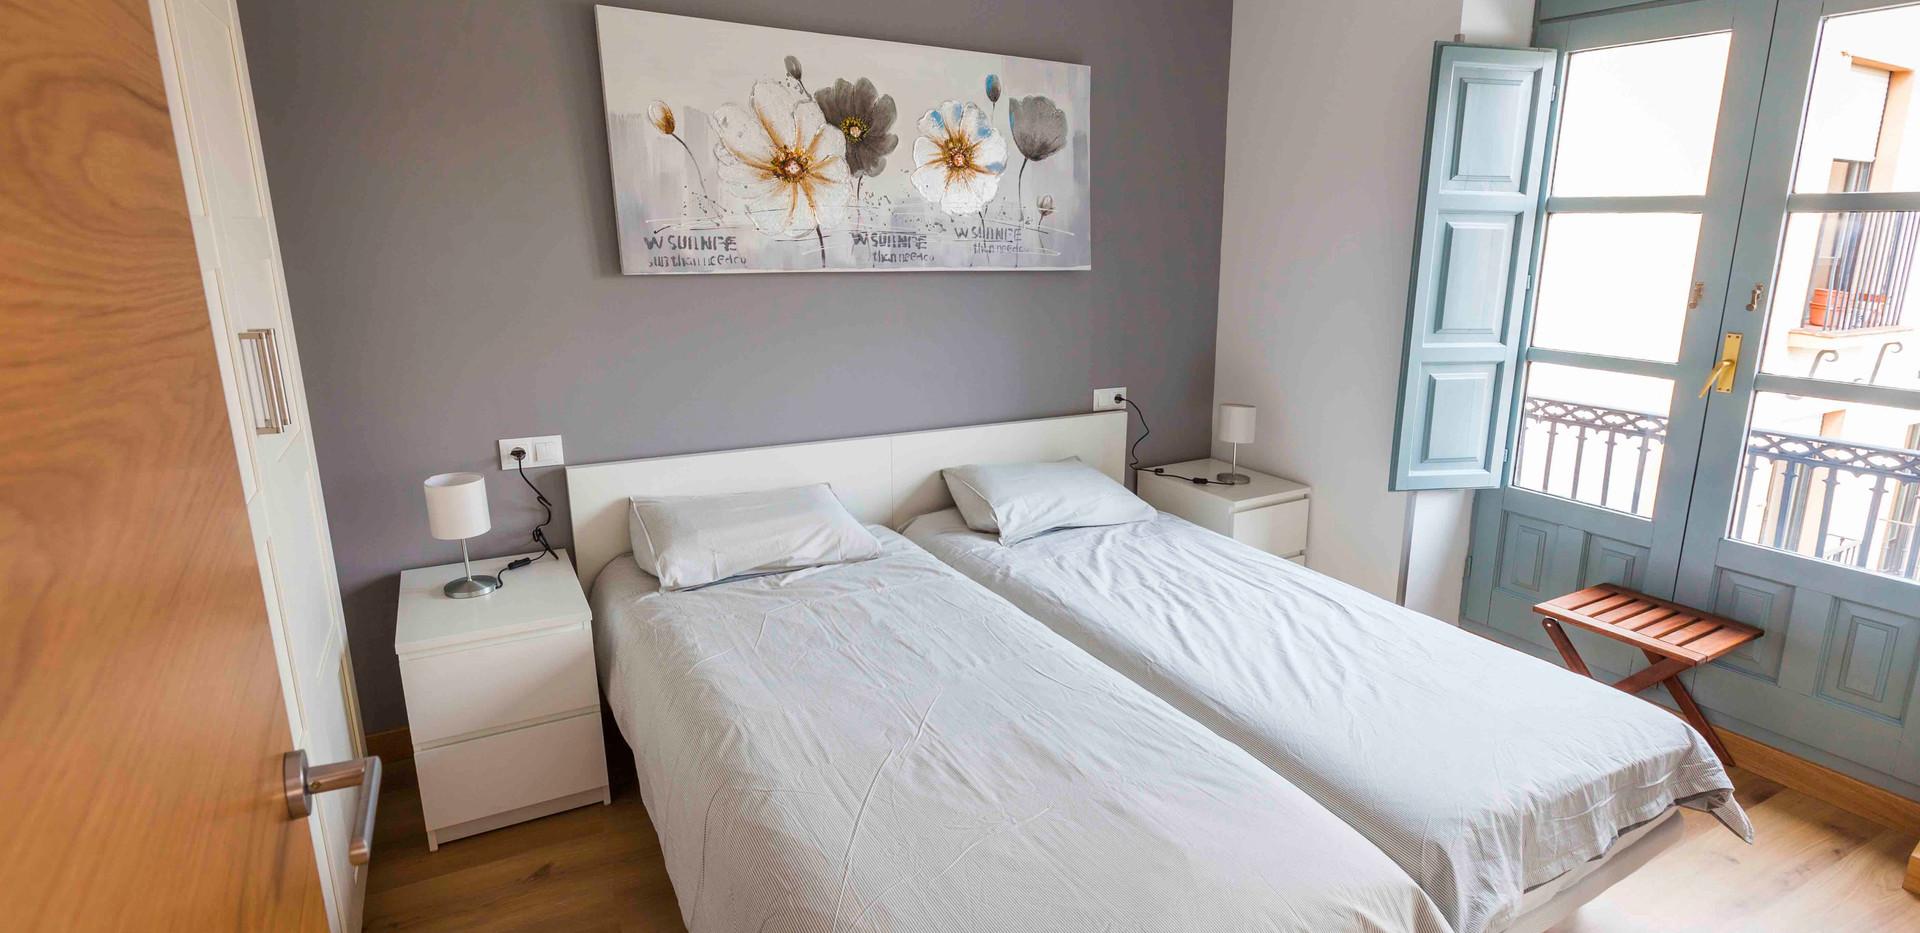 Dormitorio Fauno apartamentos A